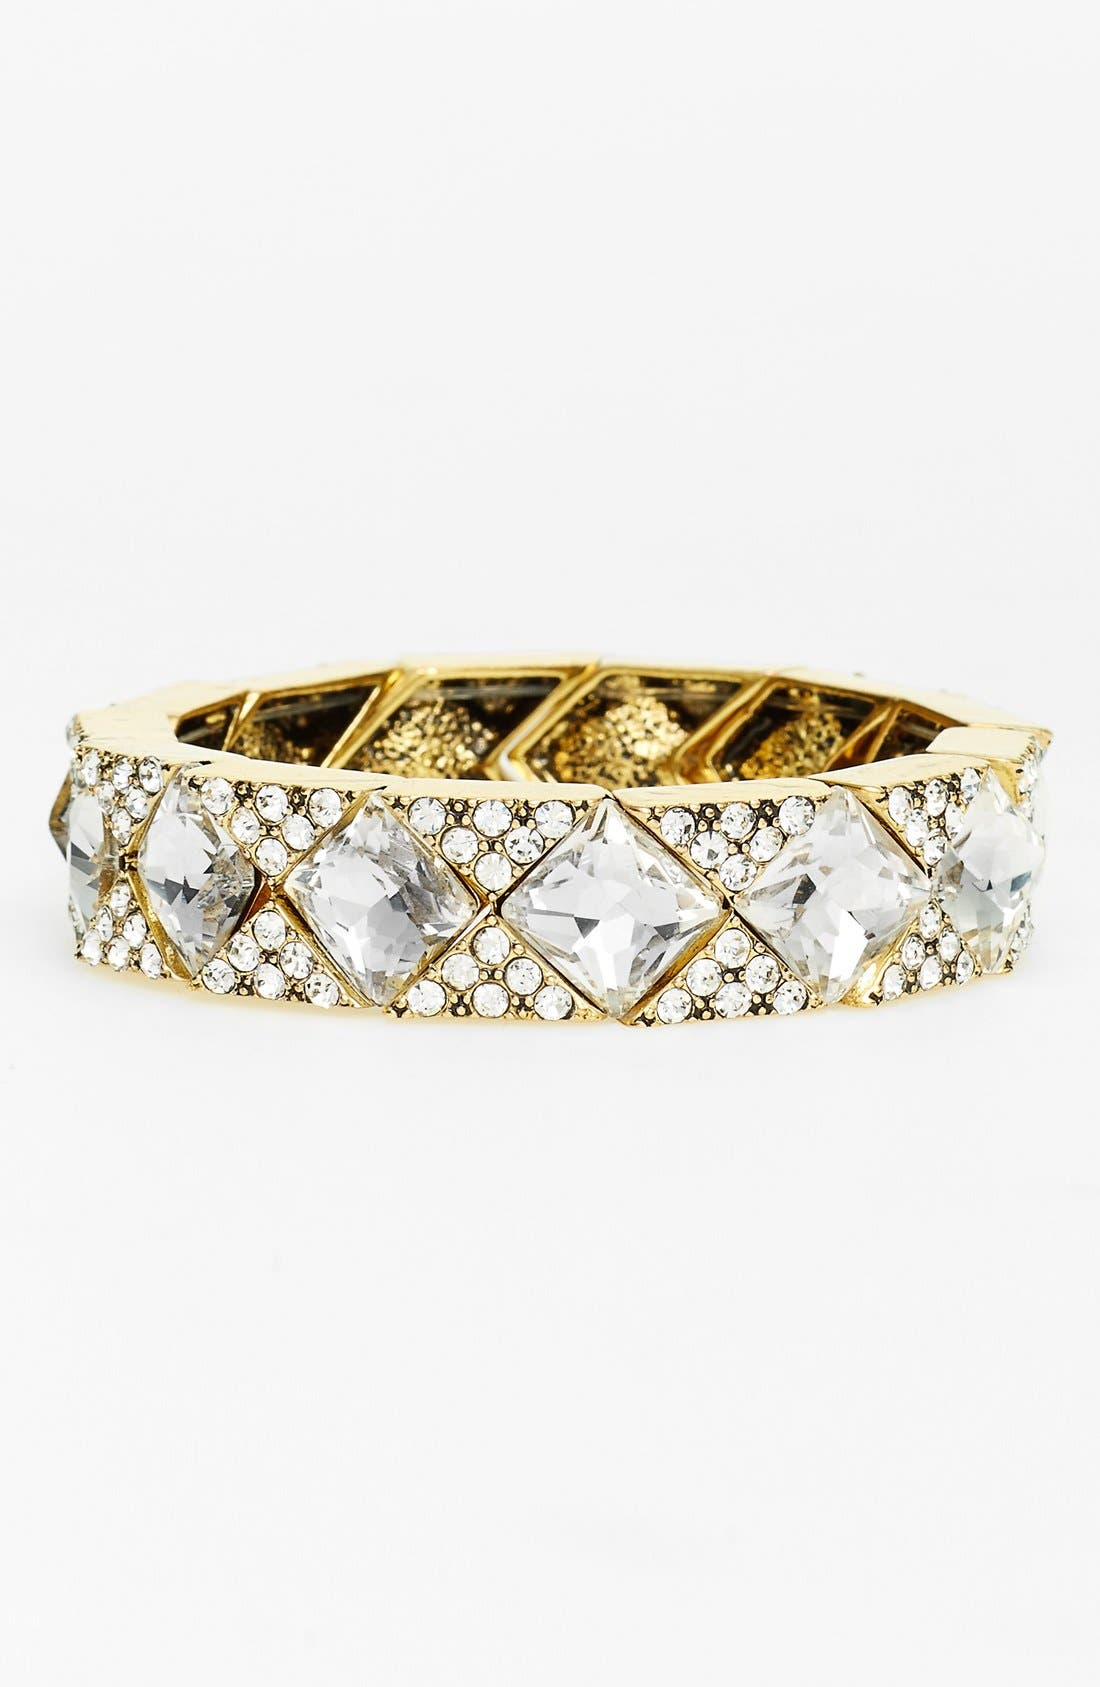 Alternate Image 1 Selected - Natasha Couture 'Jack' Crystal Stretch Bracelet